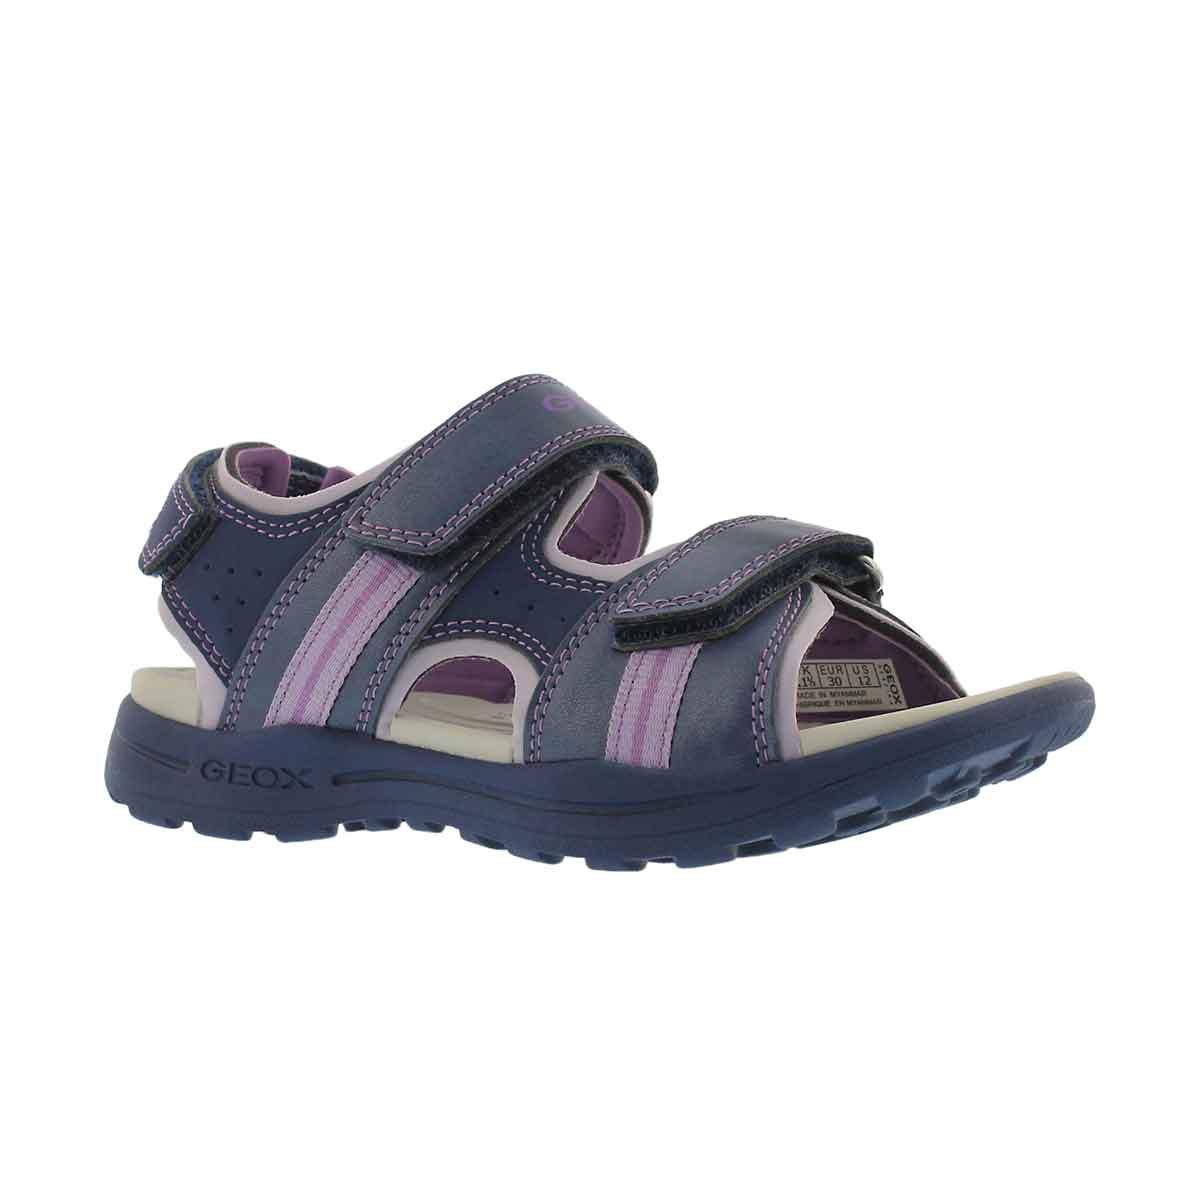 Girls' VANIETT navy/lilac casual sandals